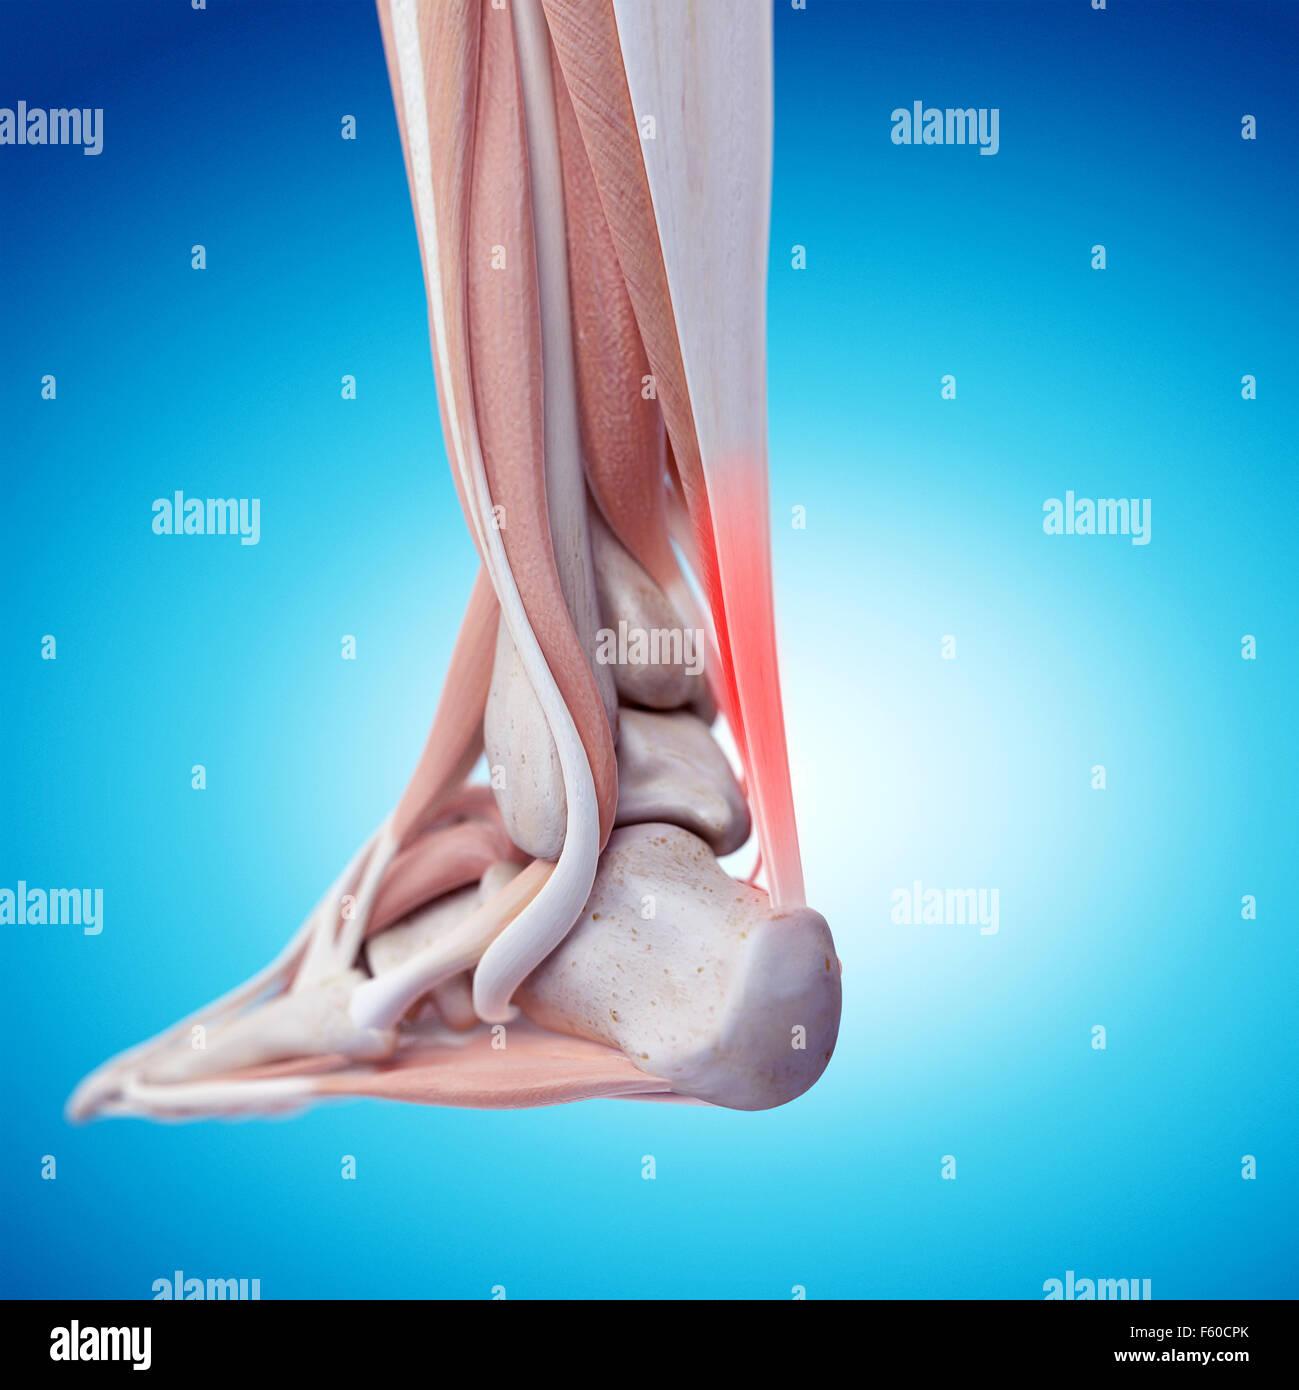 Foot Ankle Bones Anatomy Male Stockfotos & Foot Ankle Bones Anatomy ...